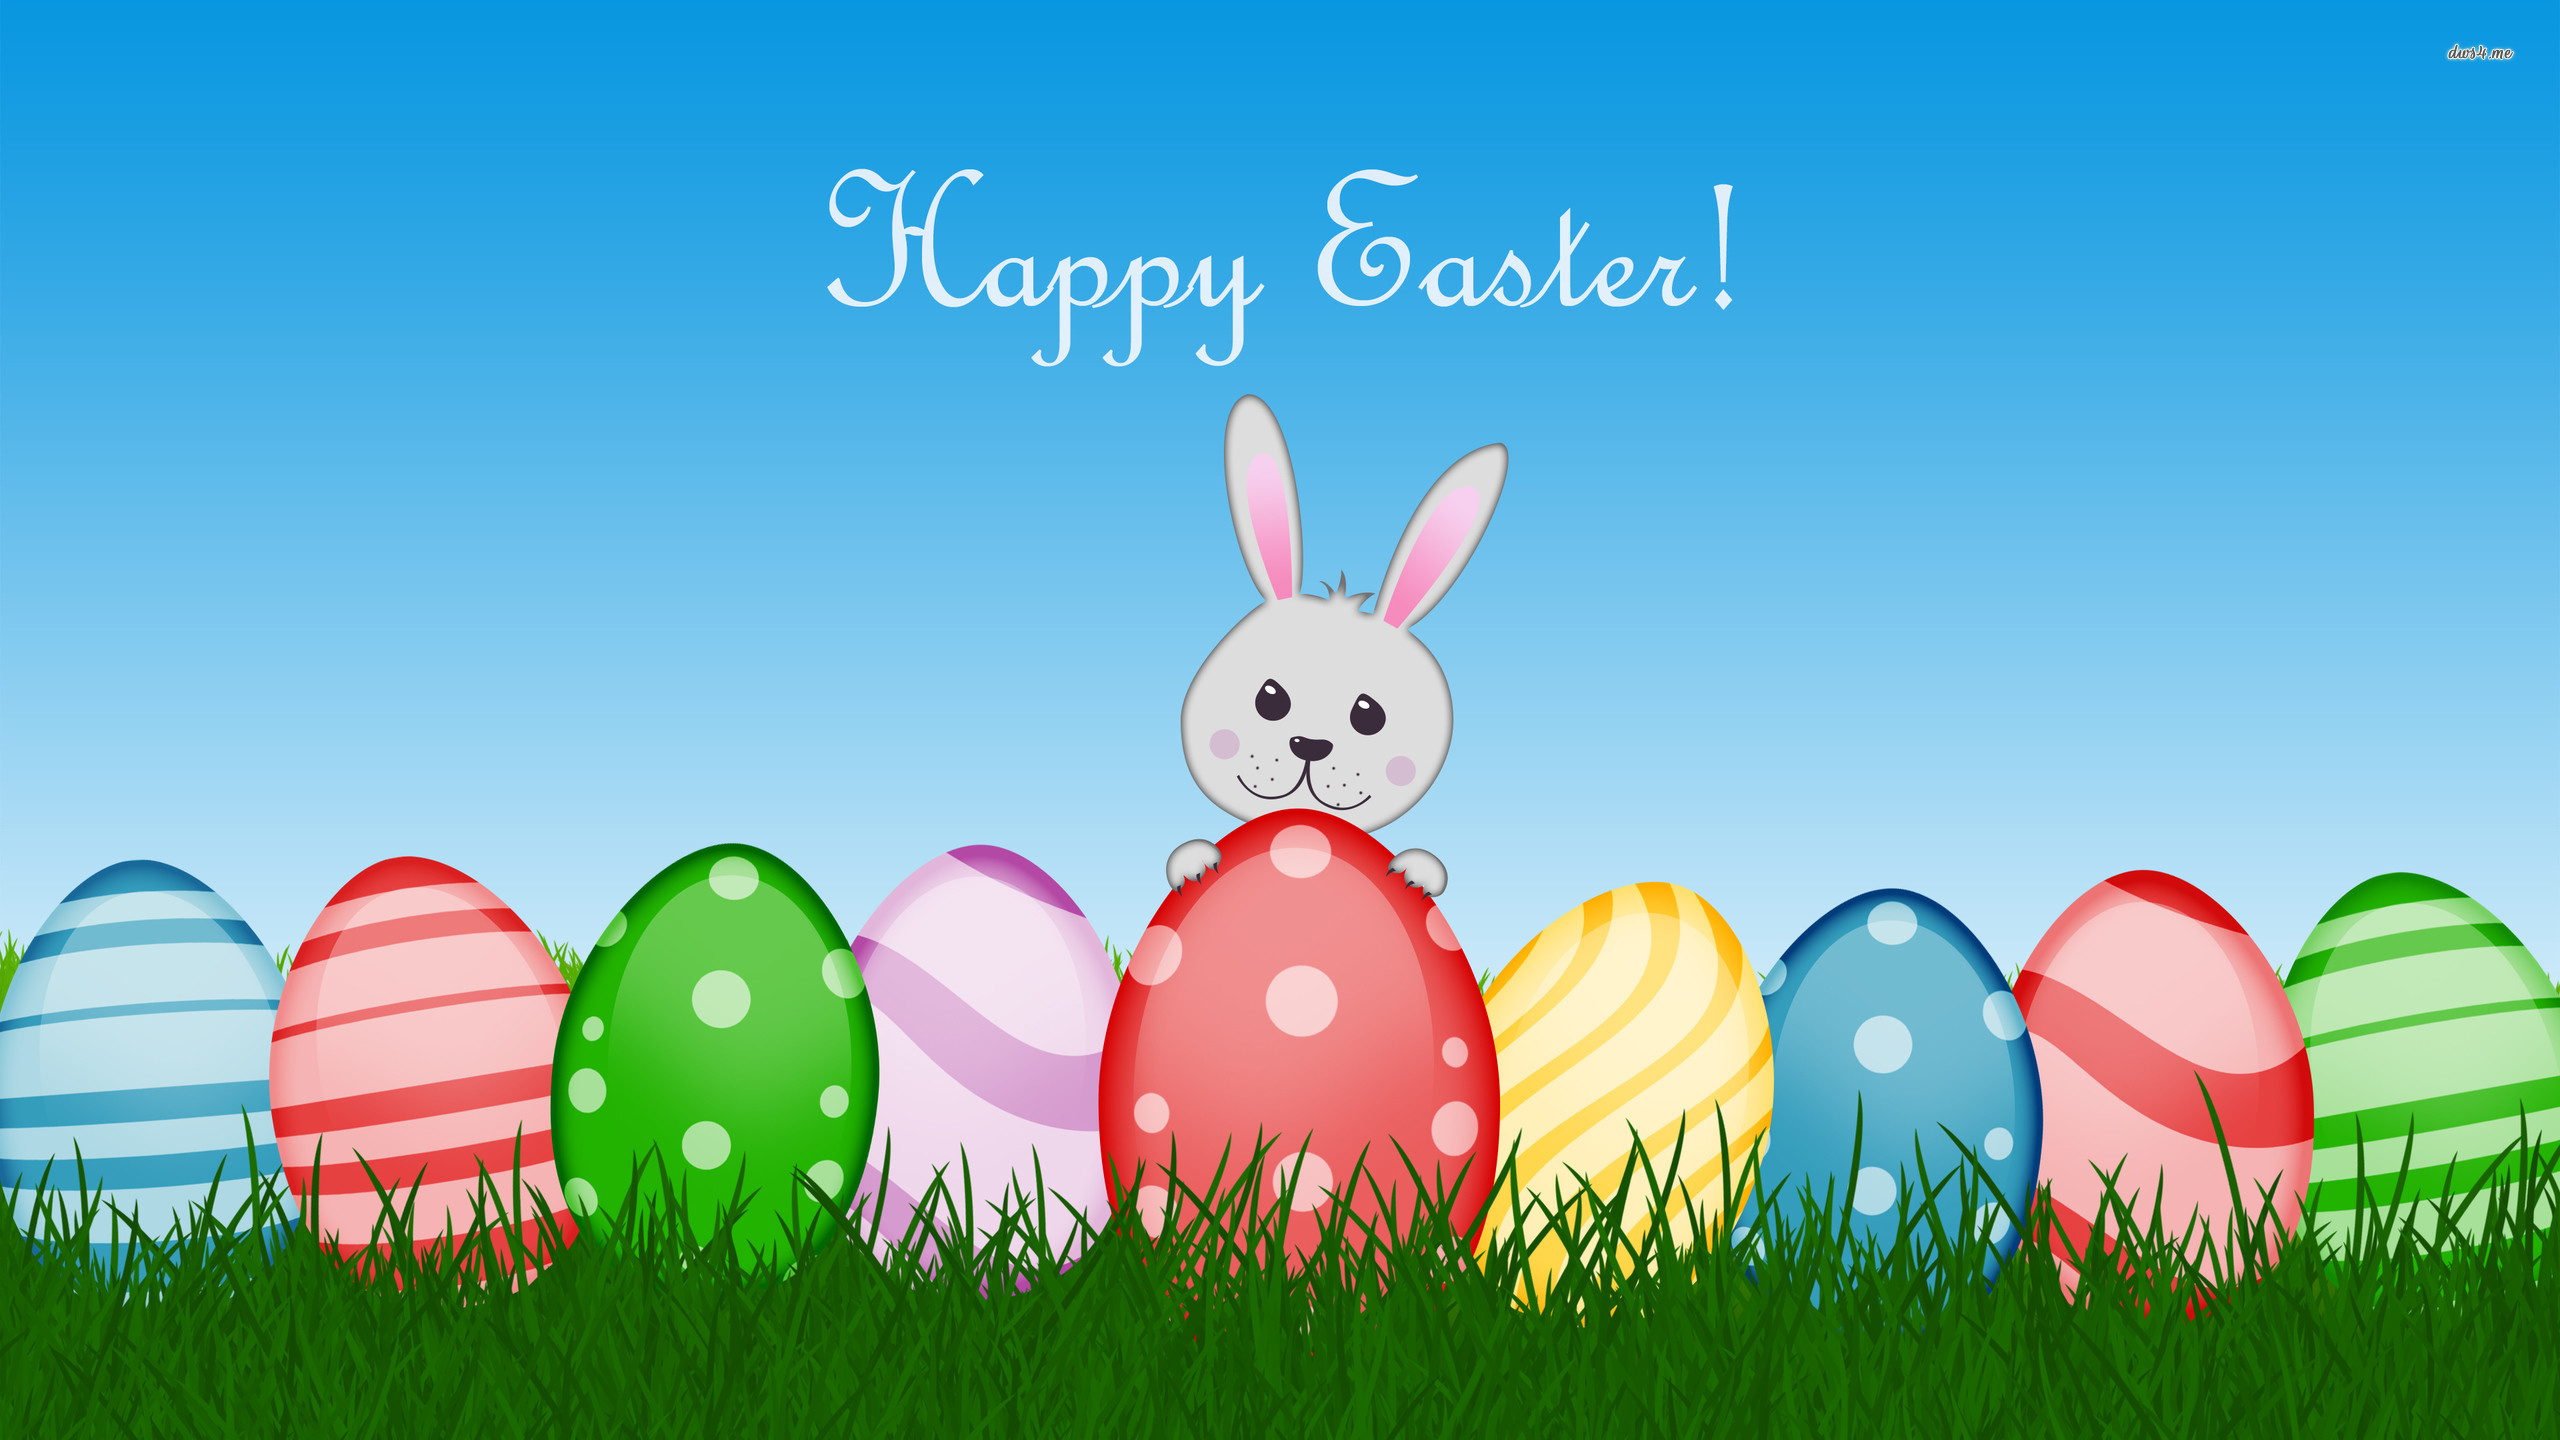 Happy Easter Backgroundjpg